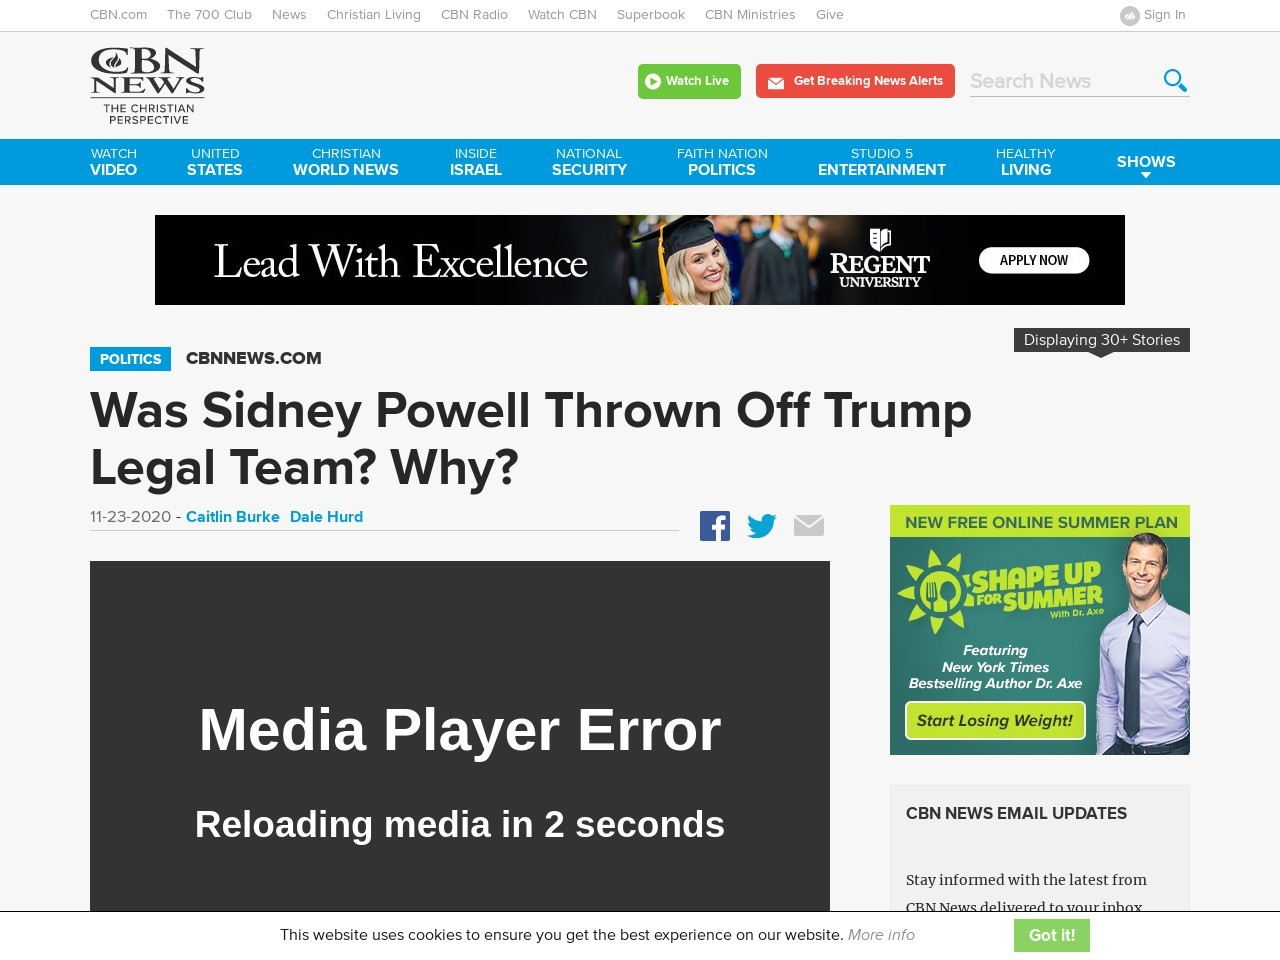 Was Sidney Powell Thrown Off Trump Legal Team? Why?